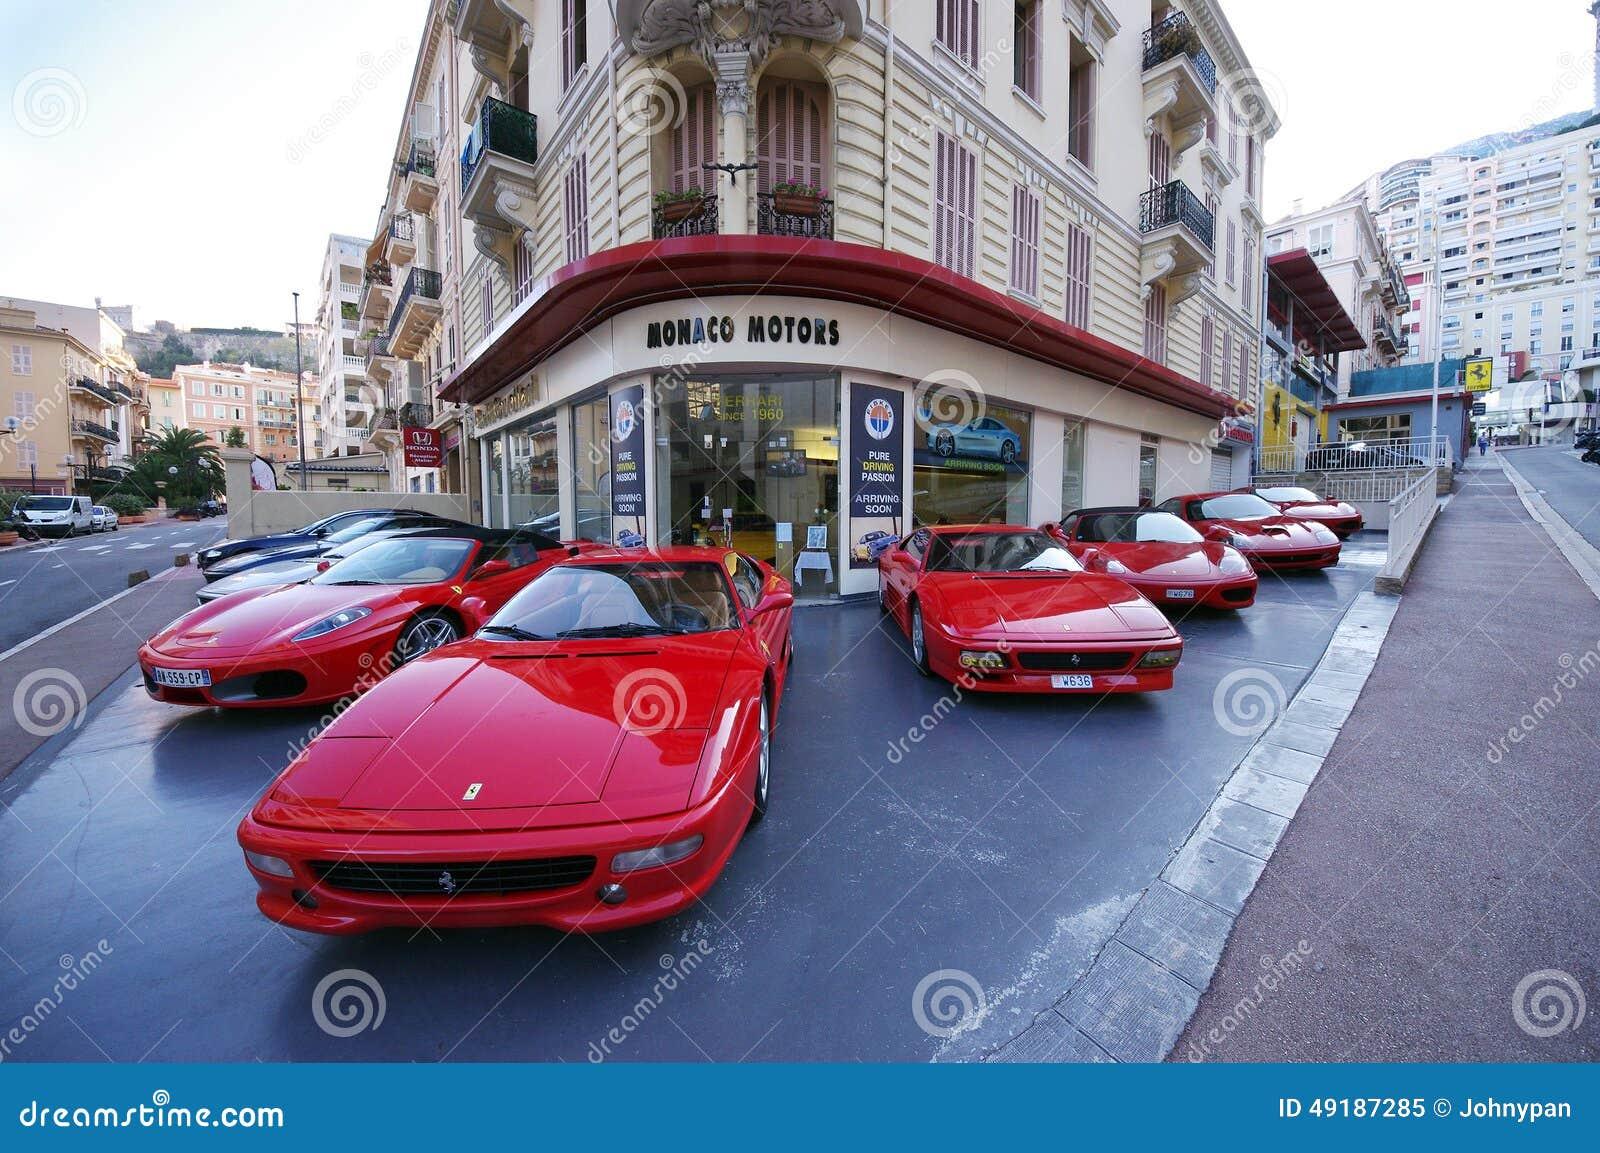 Ferrari Car Dealer Monaco Motors Editorial Image Image 49187285